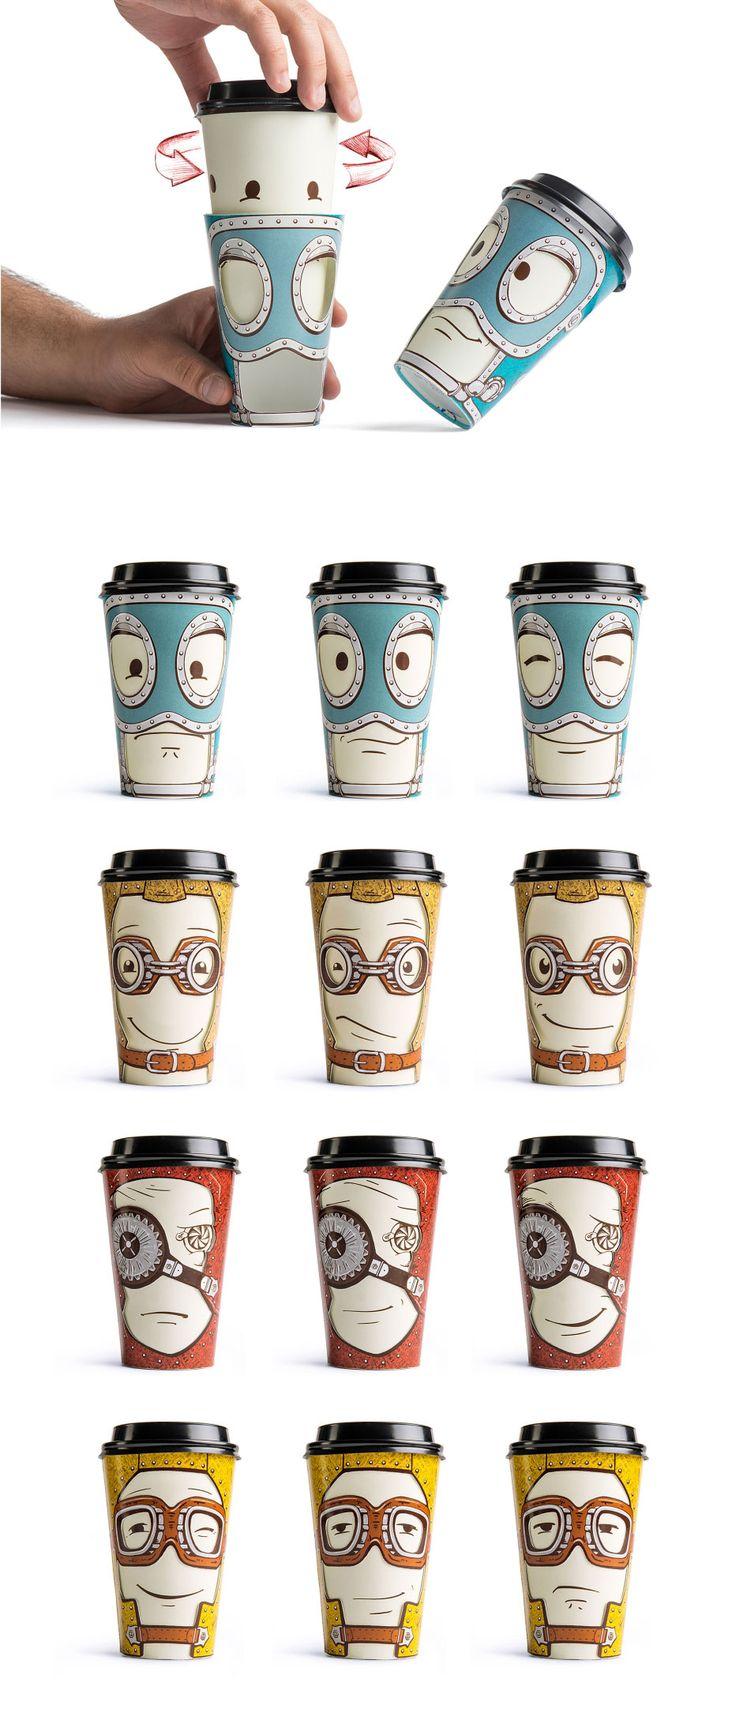 Glass juice cups design - Would You Like A Coffee Gawatt Emotions Limited Edition Created By Backbone Branding For Gawatt